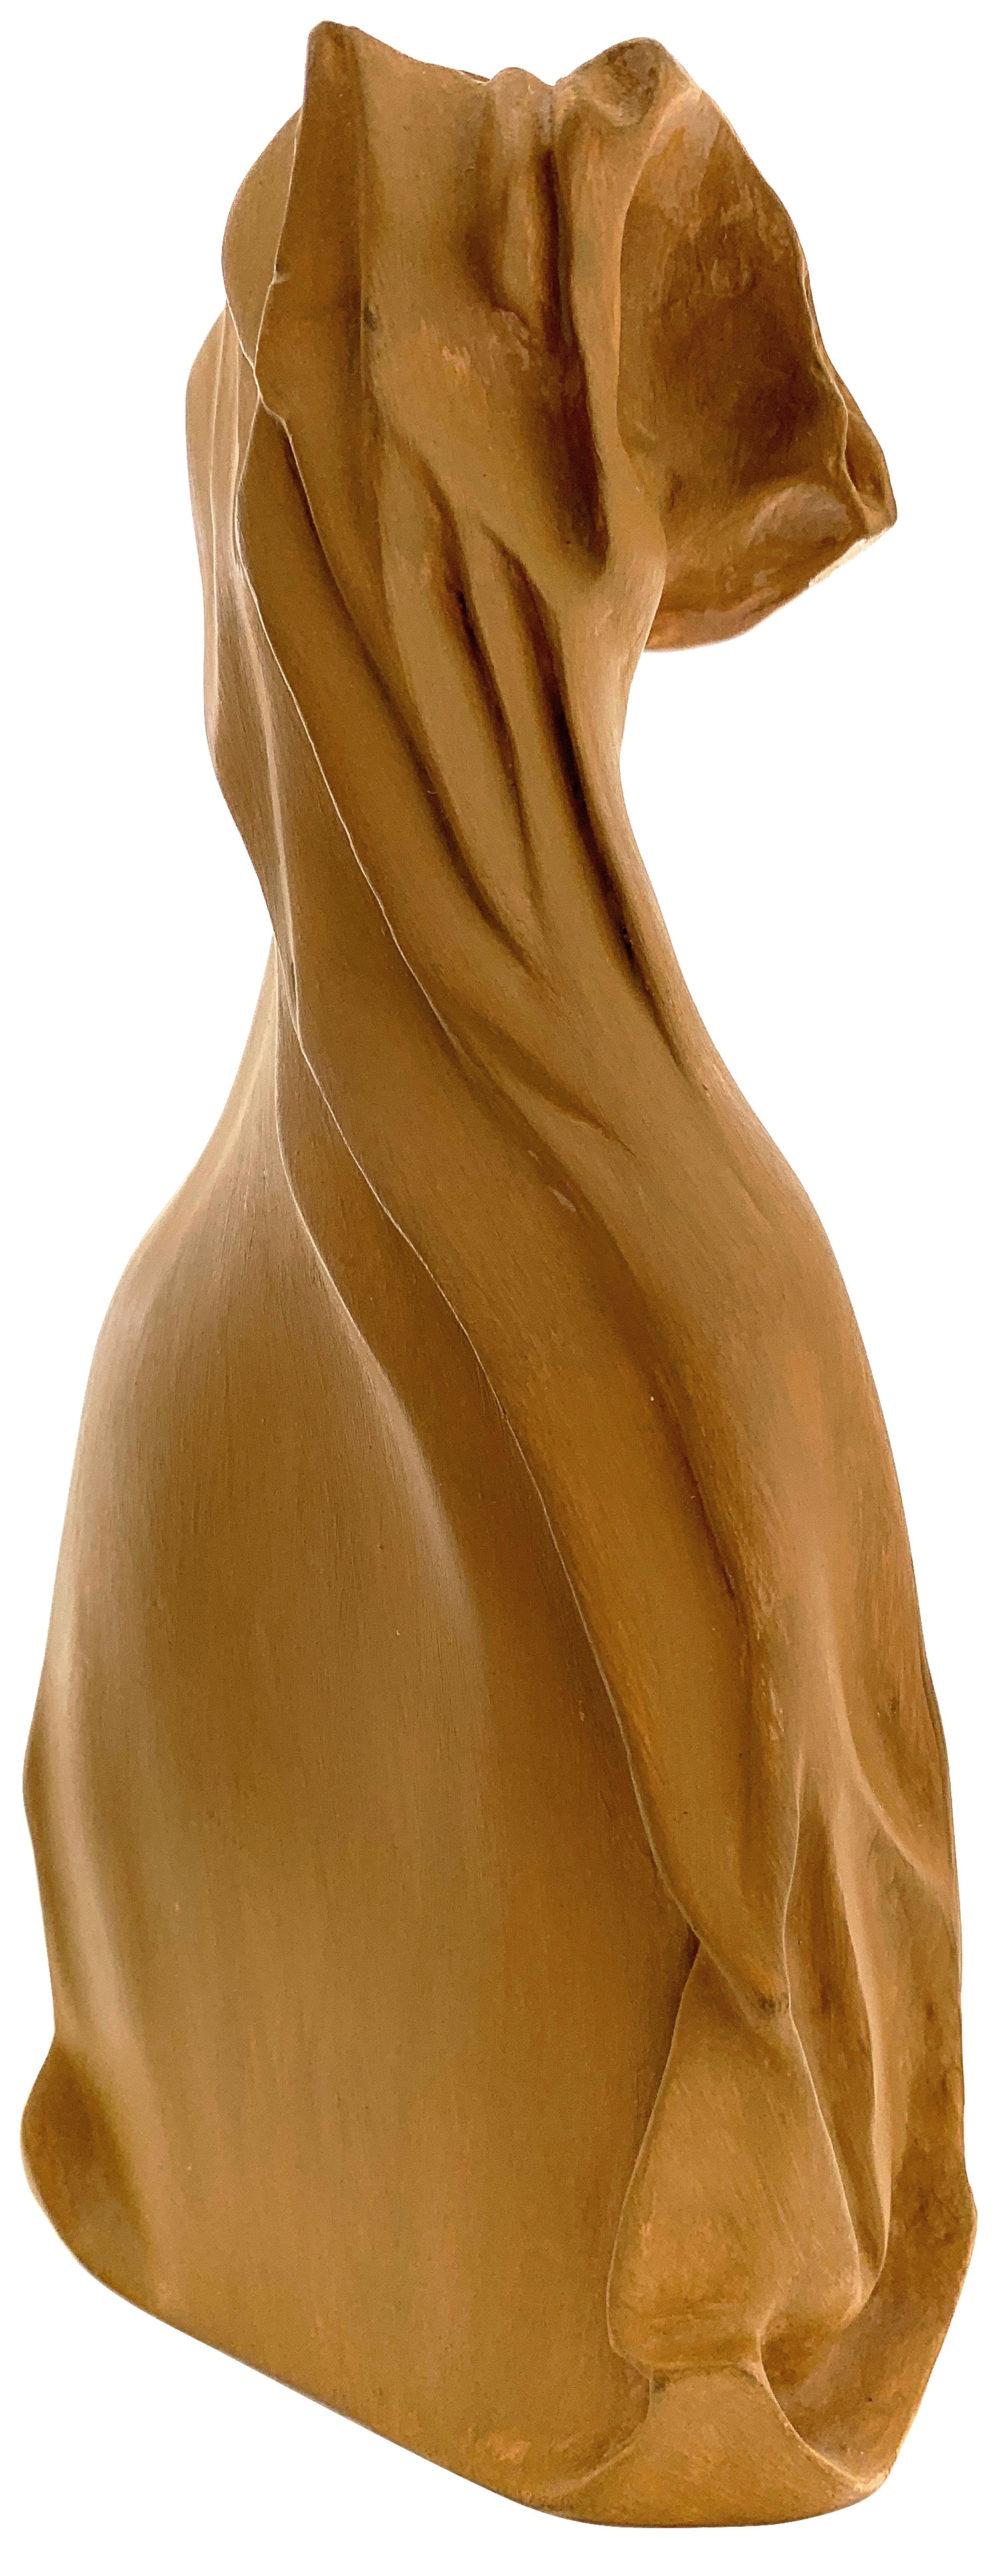 wood sculpture by rick kroninger | Felder Gallery